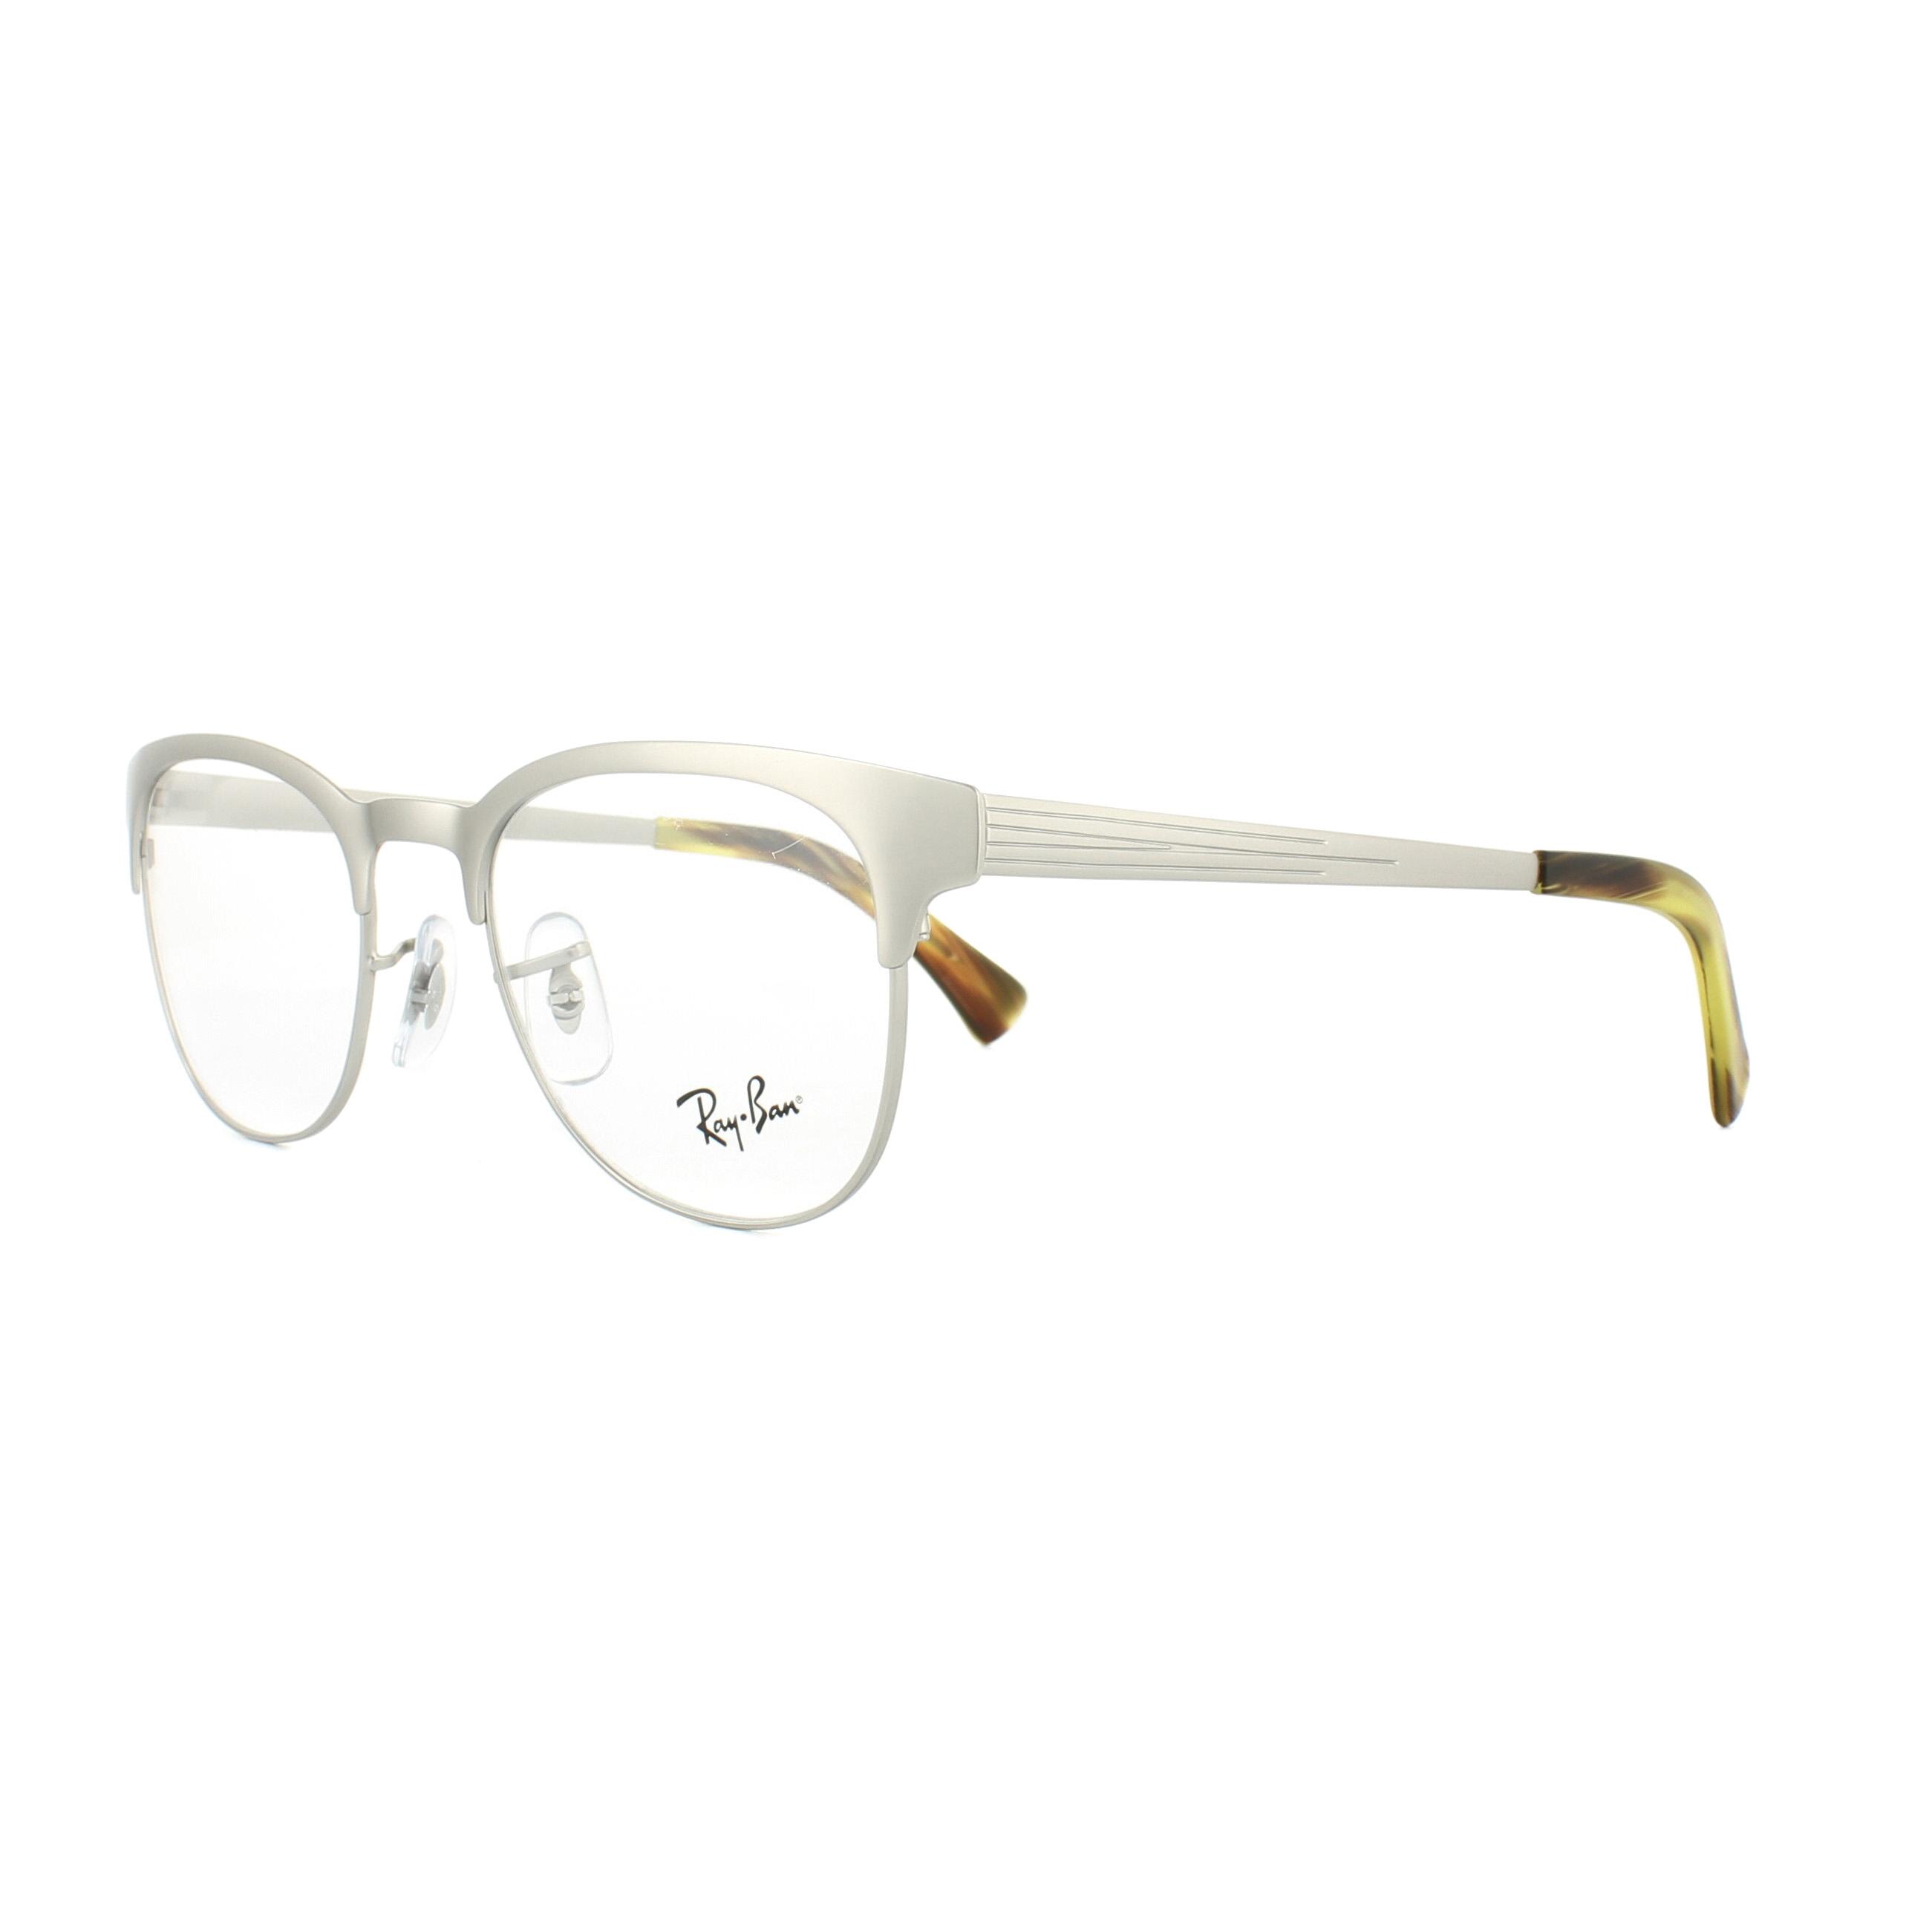 c8fa3bef201 ... matte silver eyeglasses 93a77 8f70b switzerland sentinel ray ban  glasses frames 6317 2835 silver 51mm womens b9137 47291 ...